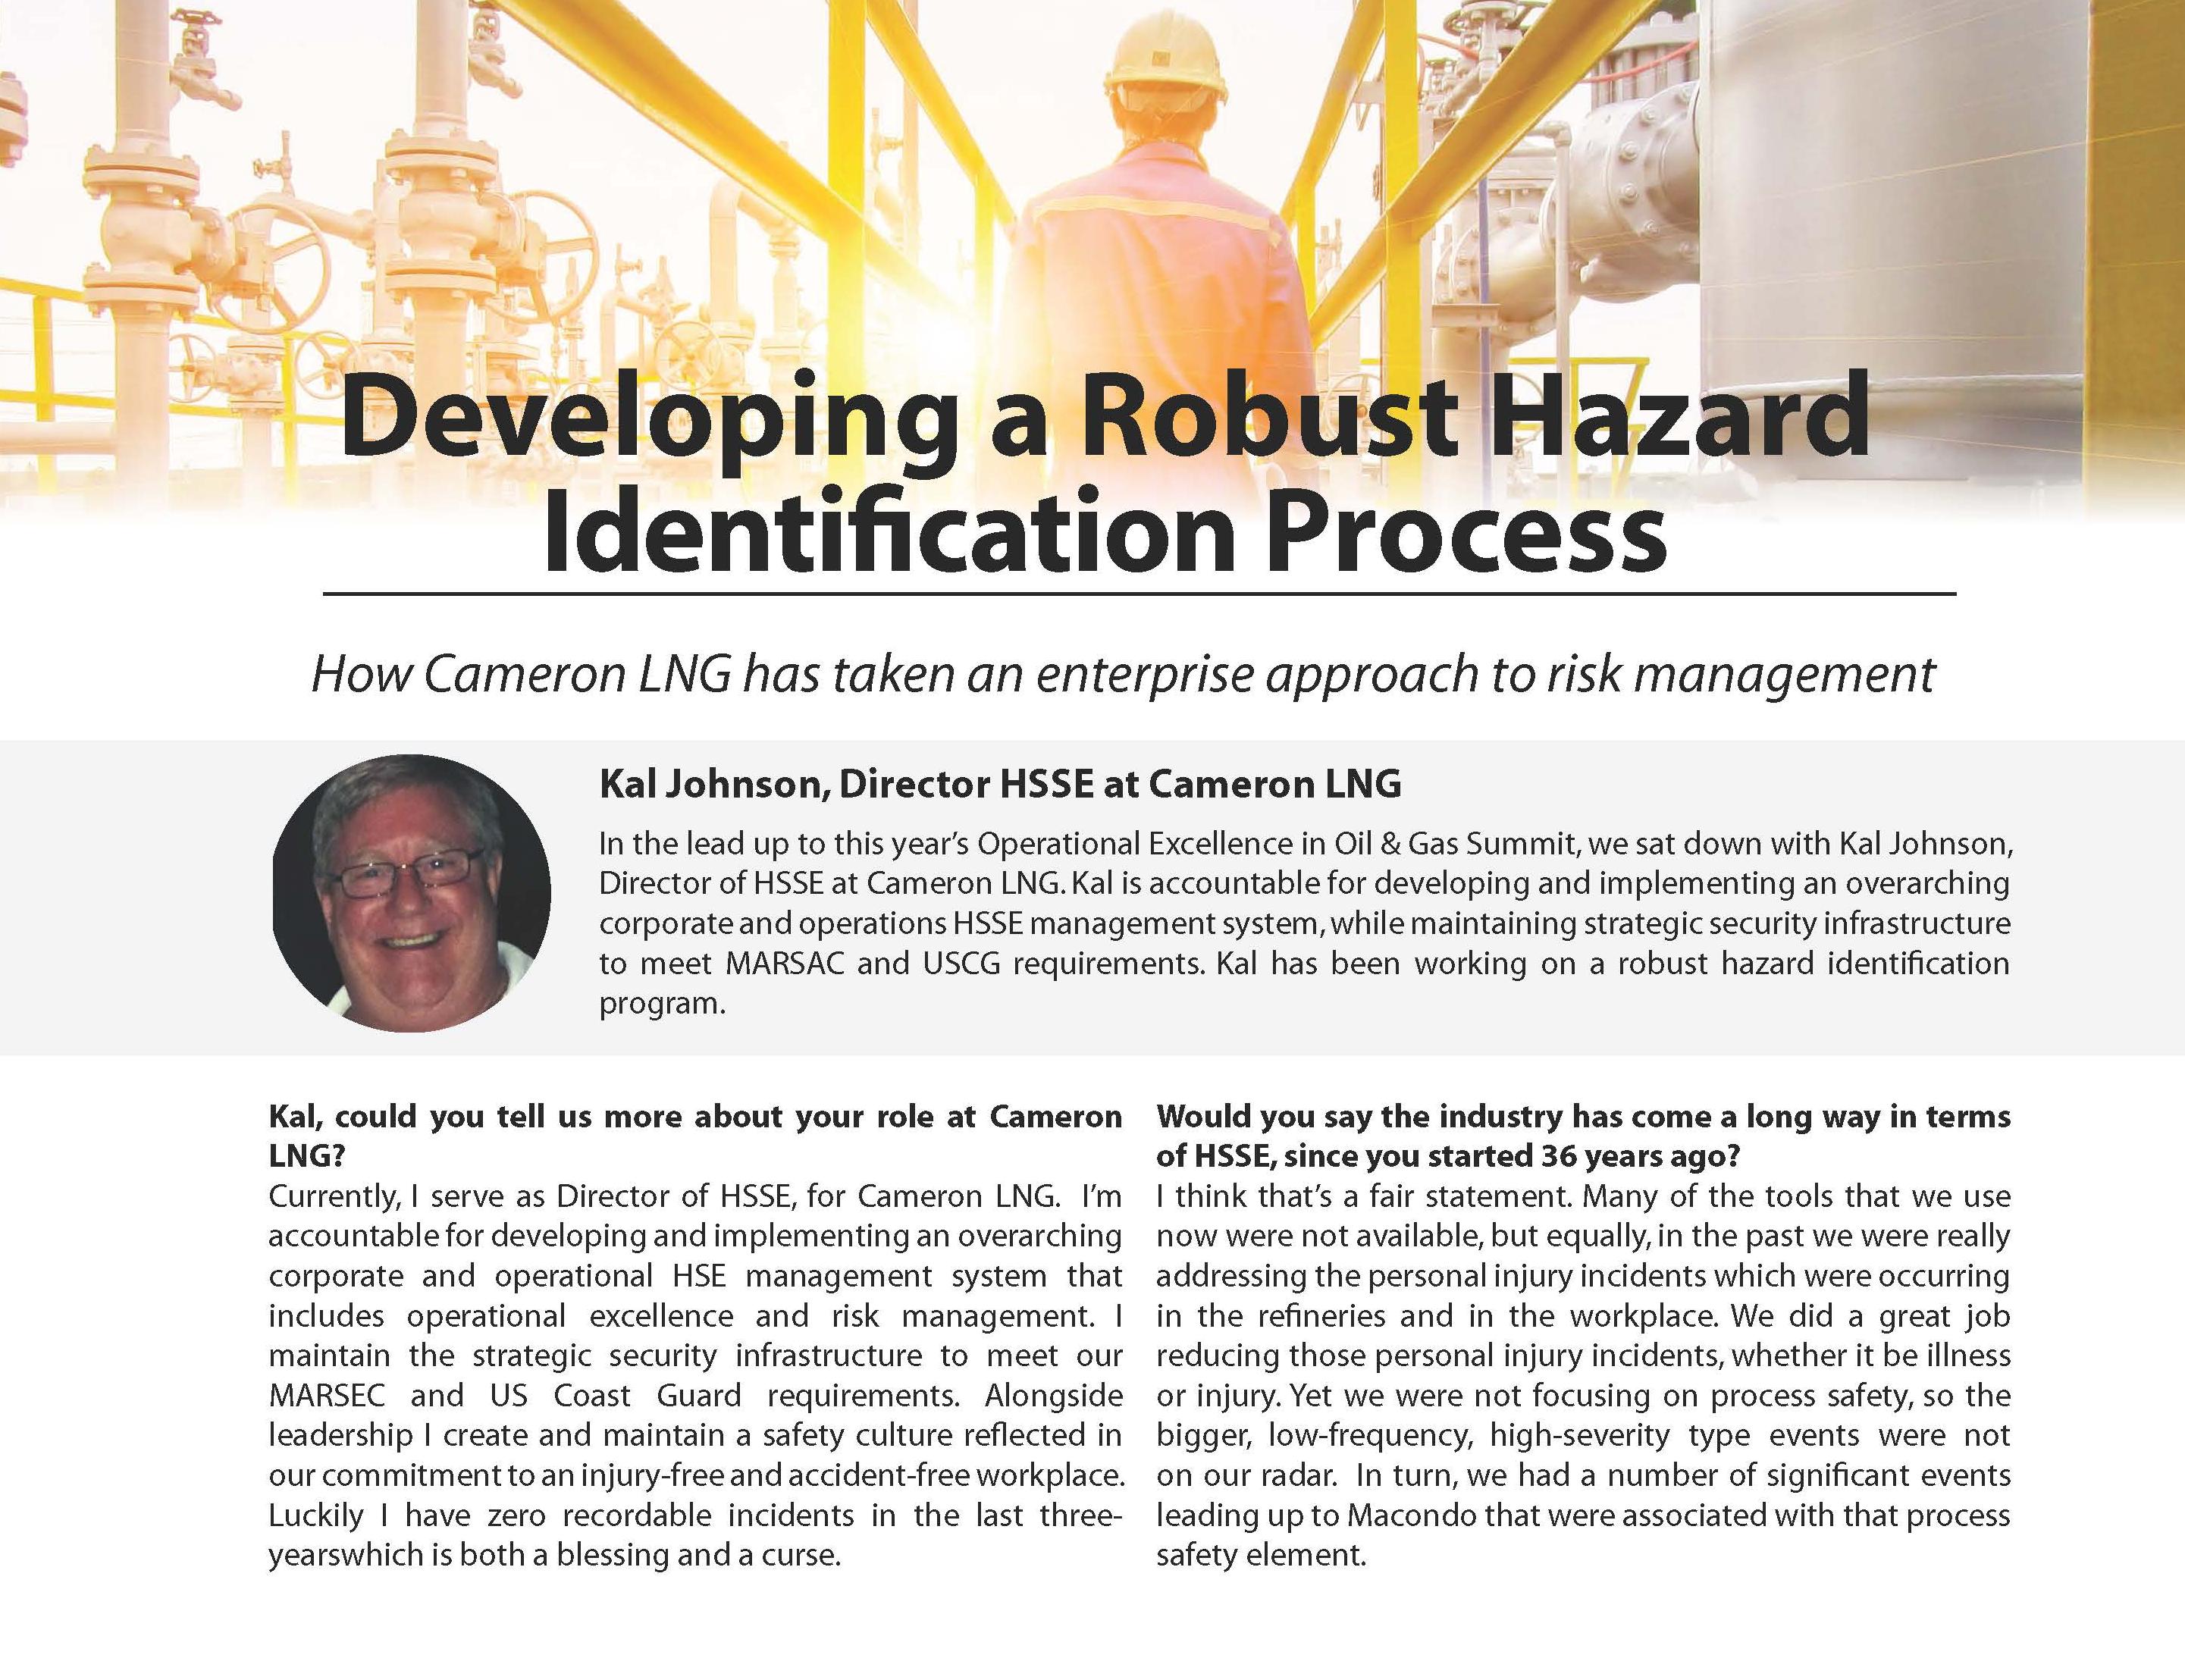 Developing a Robust Hazard Identification Process